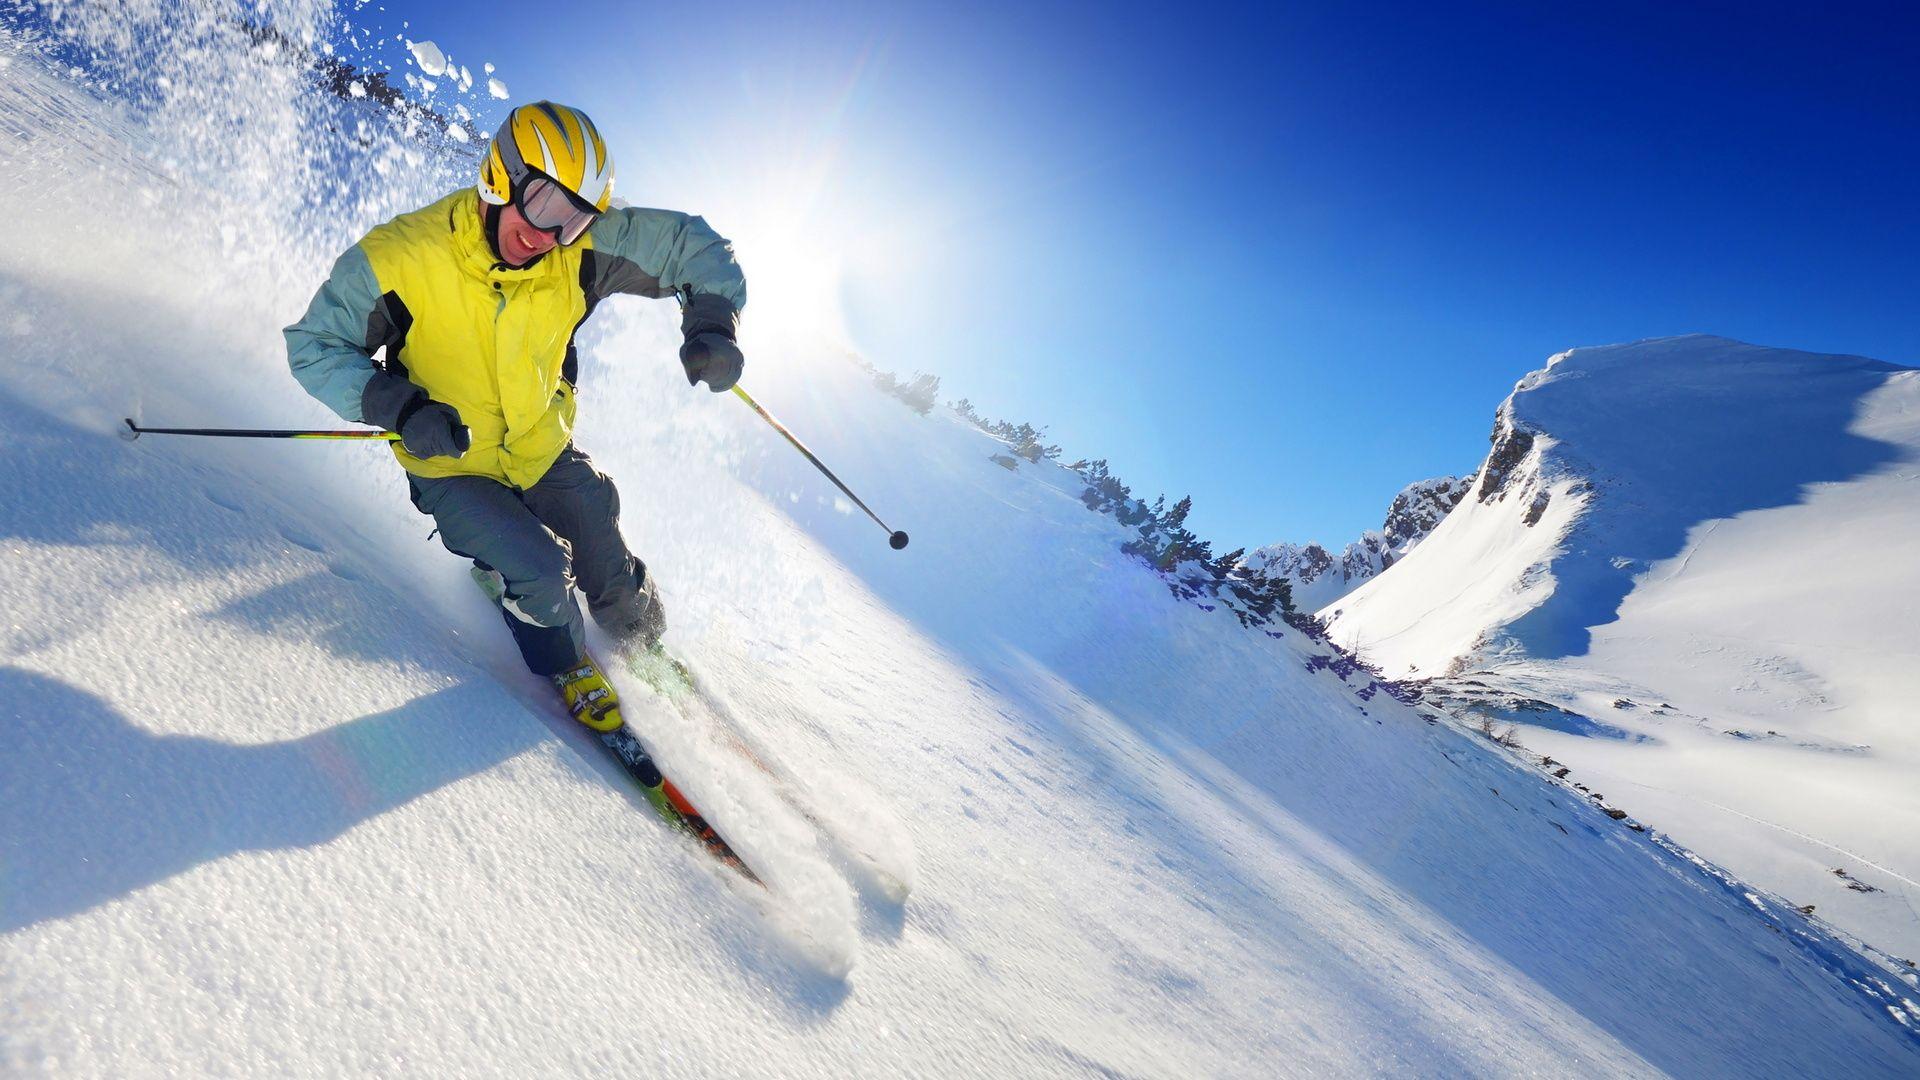 skiing hd wallpapers backgrounds wallpaper 1920×1200 ski wallpaper